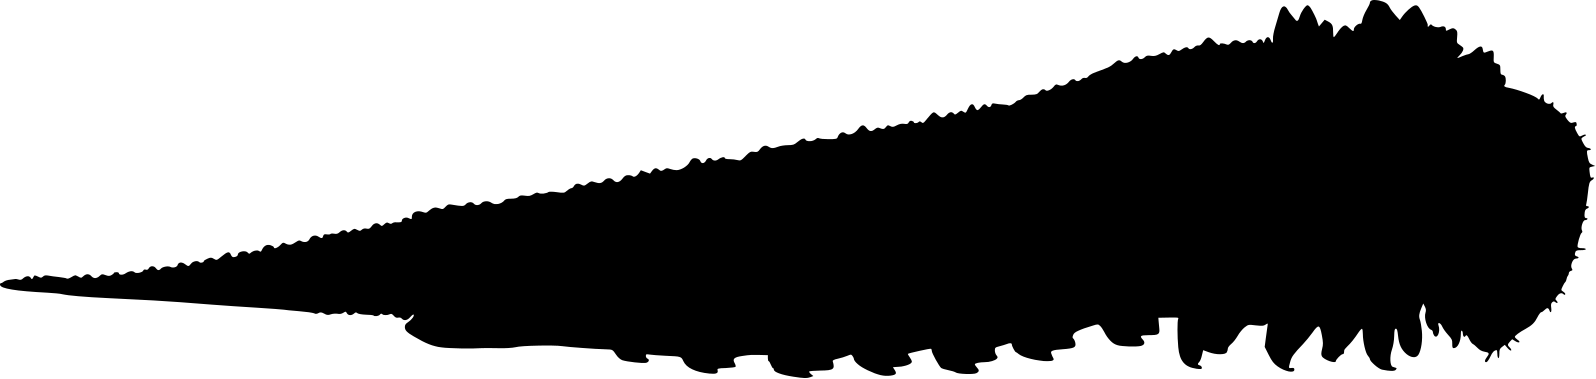 1596x379 Mouse Shaves Frog Svg Vector File, Vector Clip Art Svg File